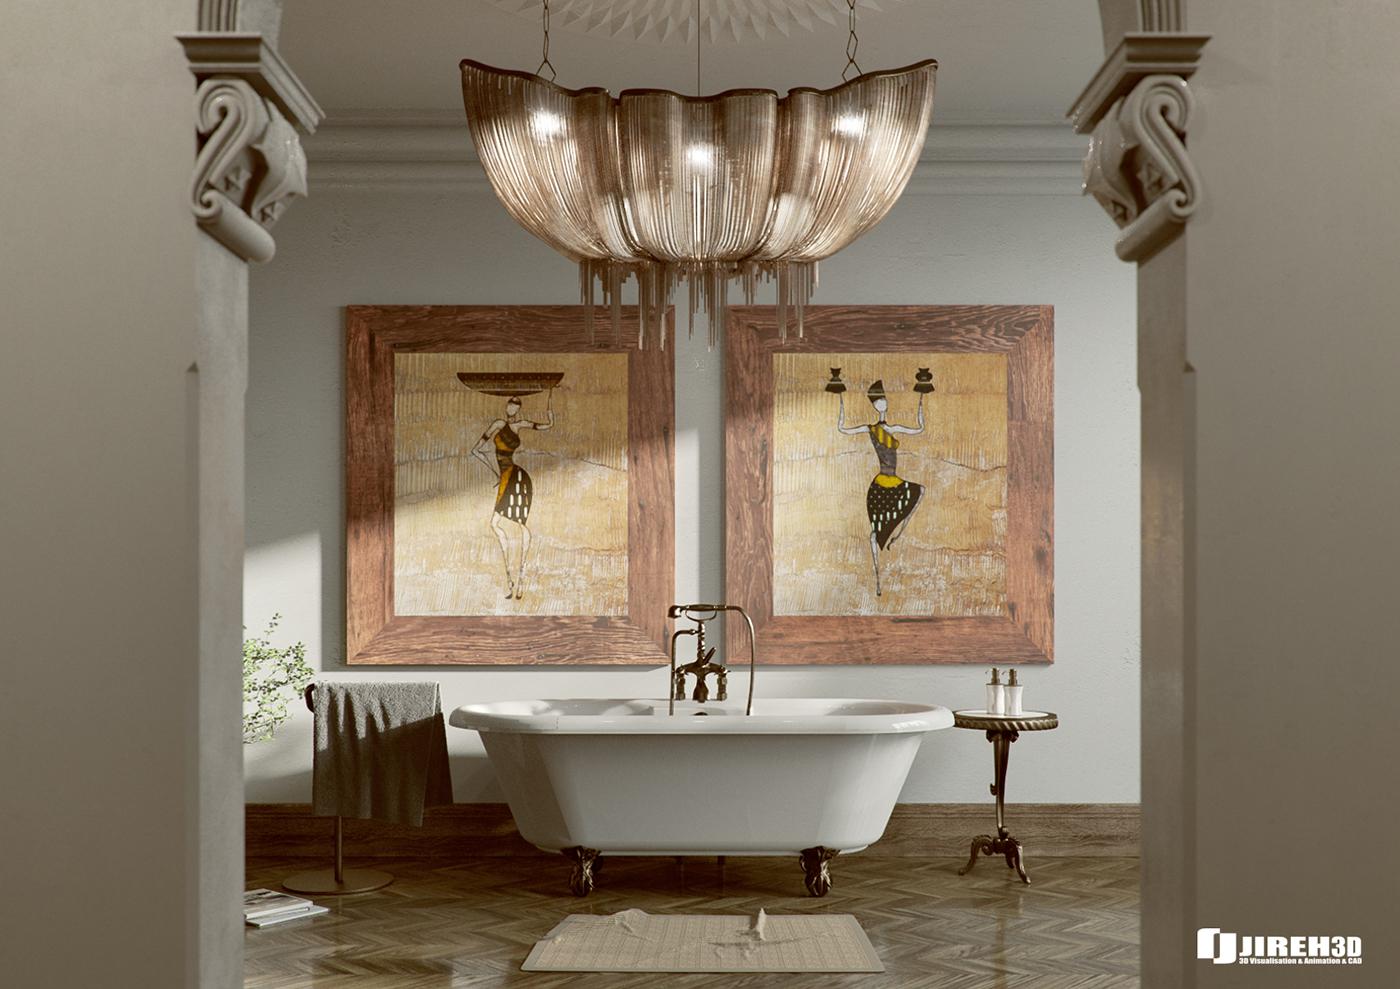 Corona C4D Scene files - African Classic Bathroom on Behance